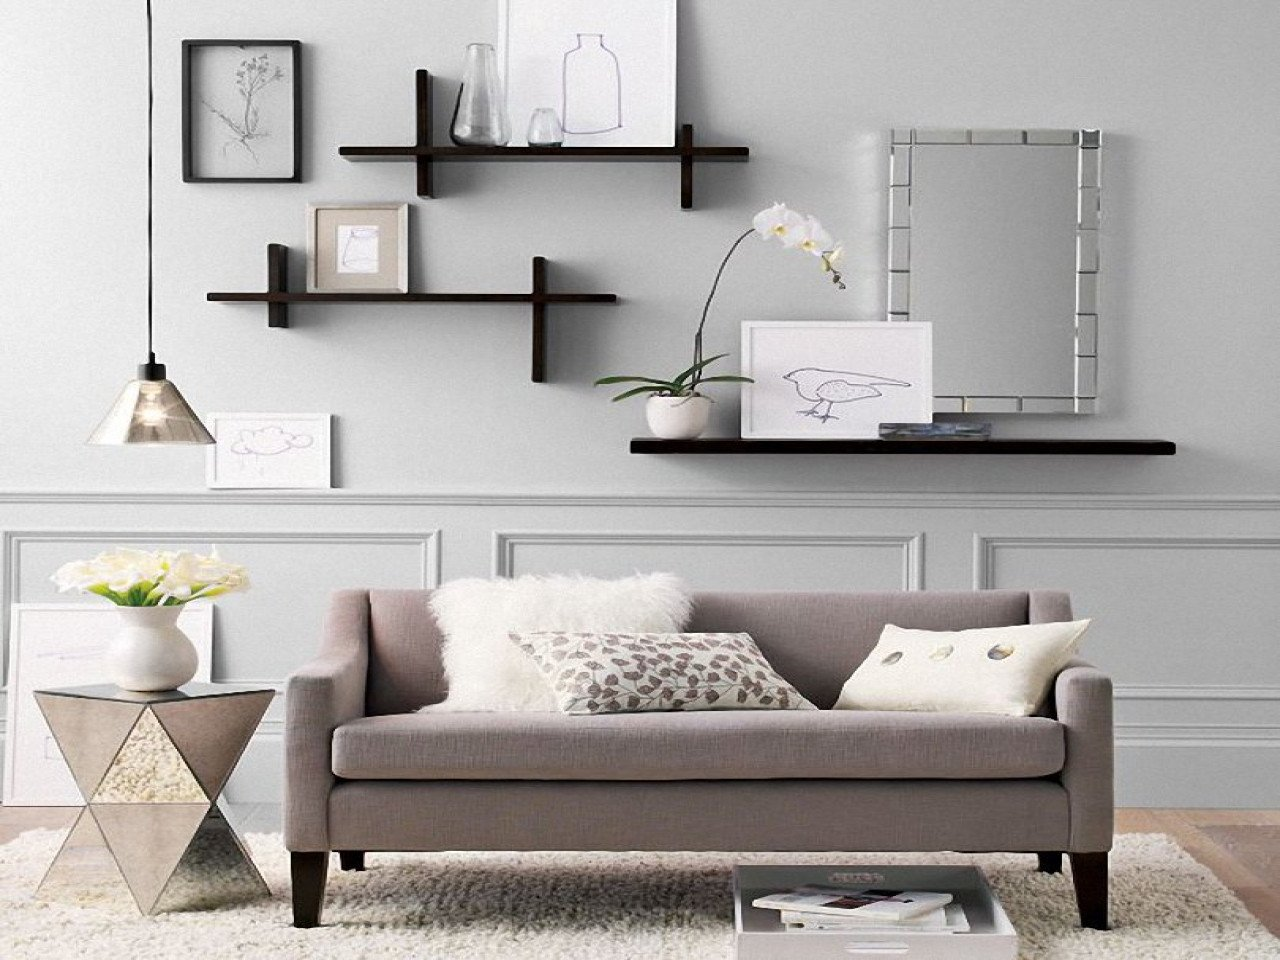 Decor for Living Room Wall Living Room Storage Shelves Home Wall Shelves Living Room